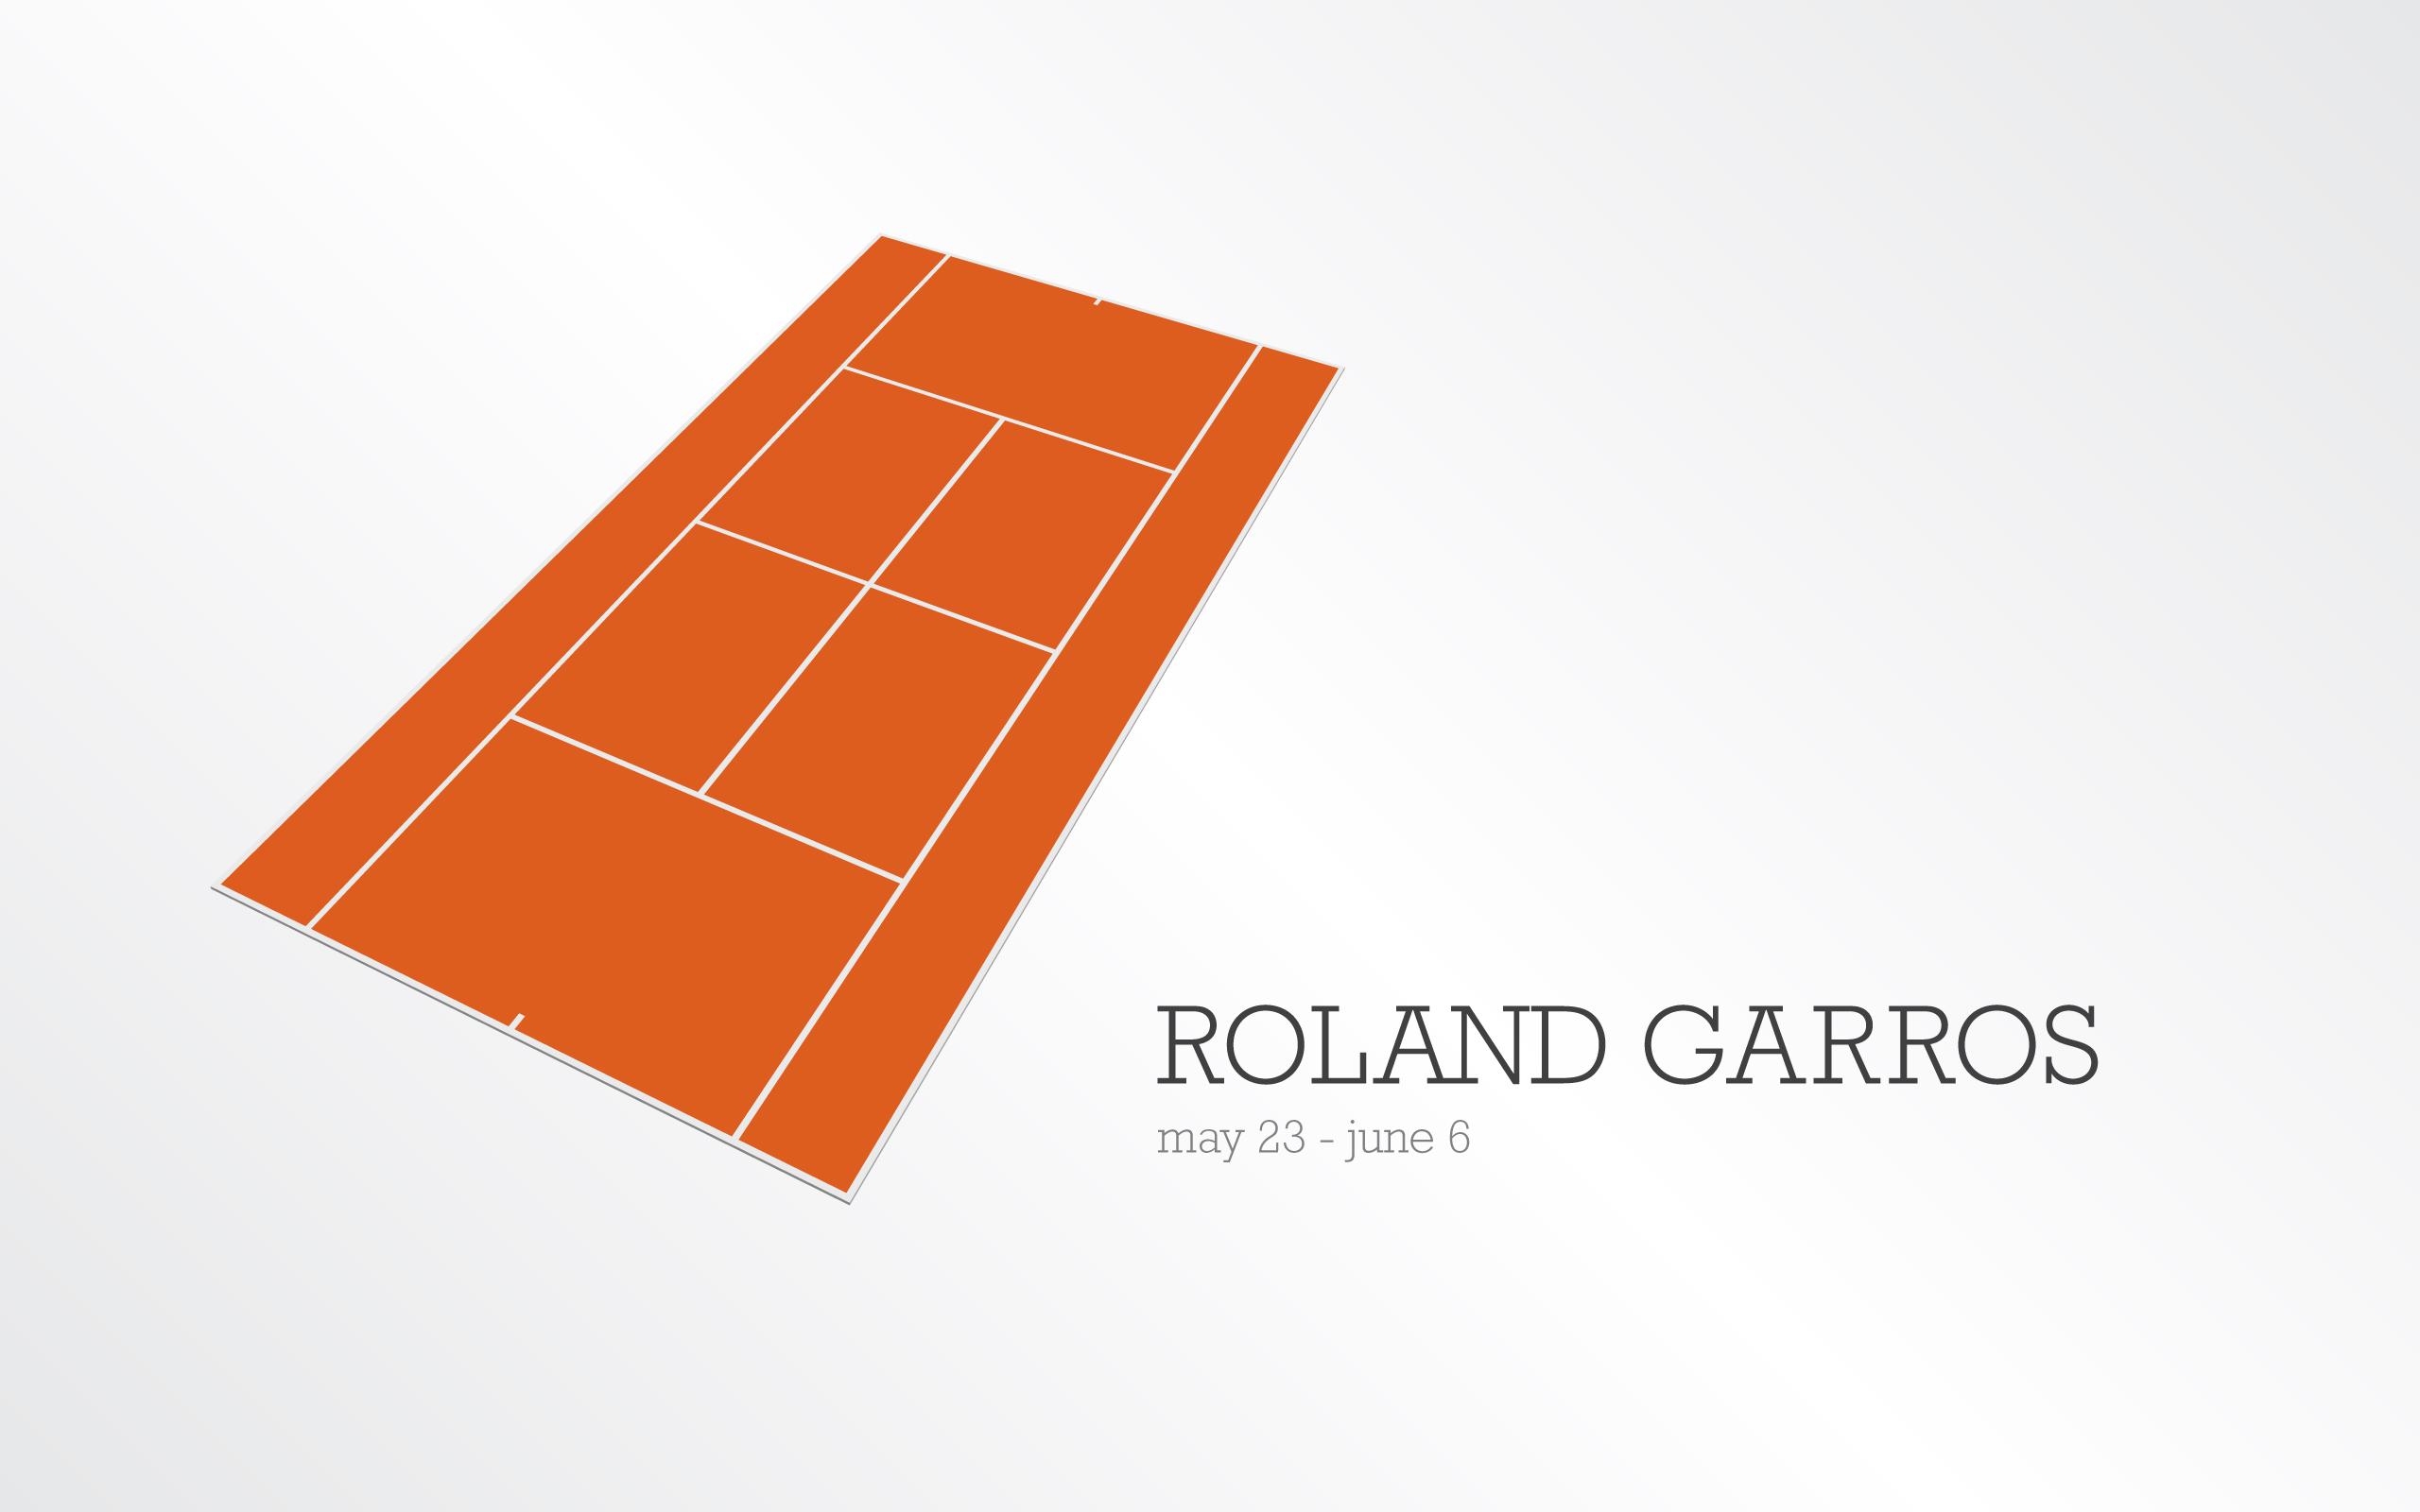 Roland Garros 2011 бесплатно